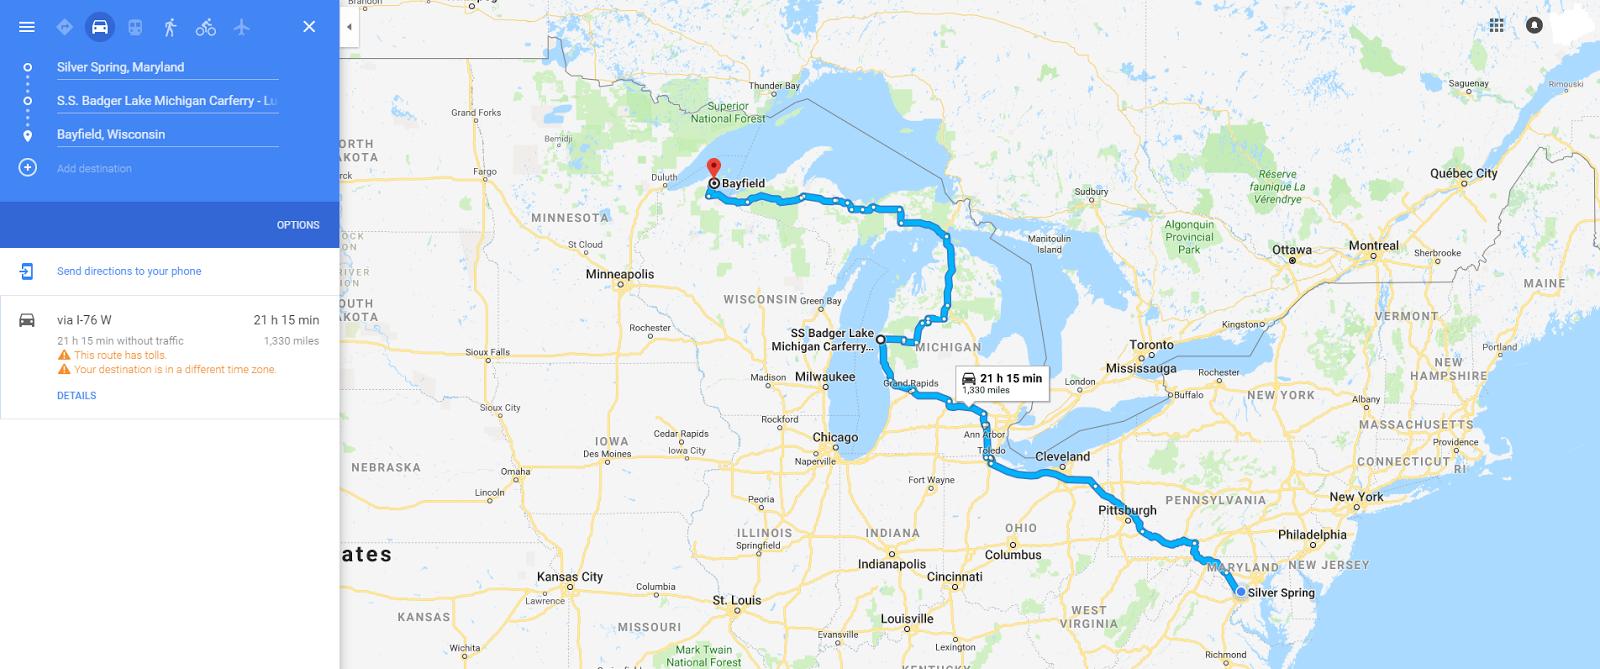 Map Of Ludington Michigan Area on map of northern michigan, map of mi on ludington michigan, map of michigan cities, map of ludington mich, map of hamlin lake ludington mi, map of eastern shoreline, map of western michigan, map of mason michigan, map of lower michigan counties, map of ludington michigan ward, map of michigan ludington state park campground, map of pentwater mi, map of ludington hotels,